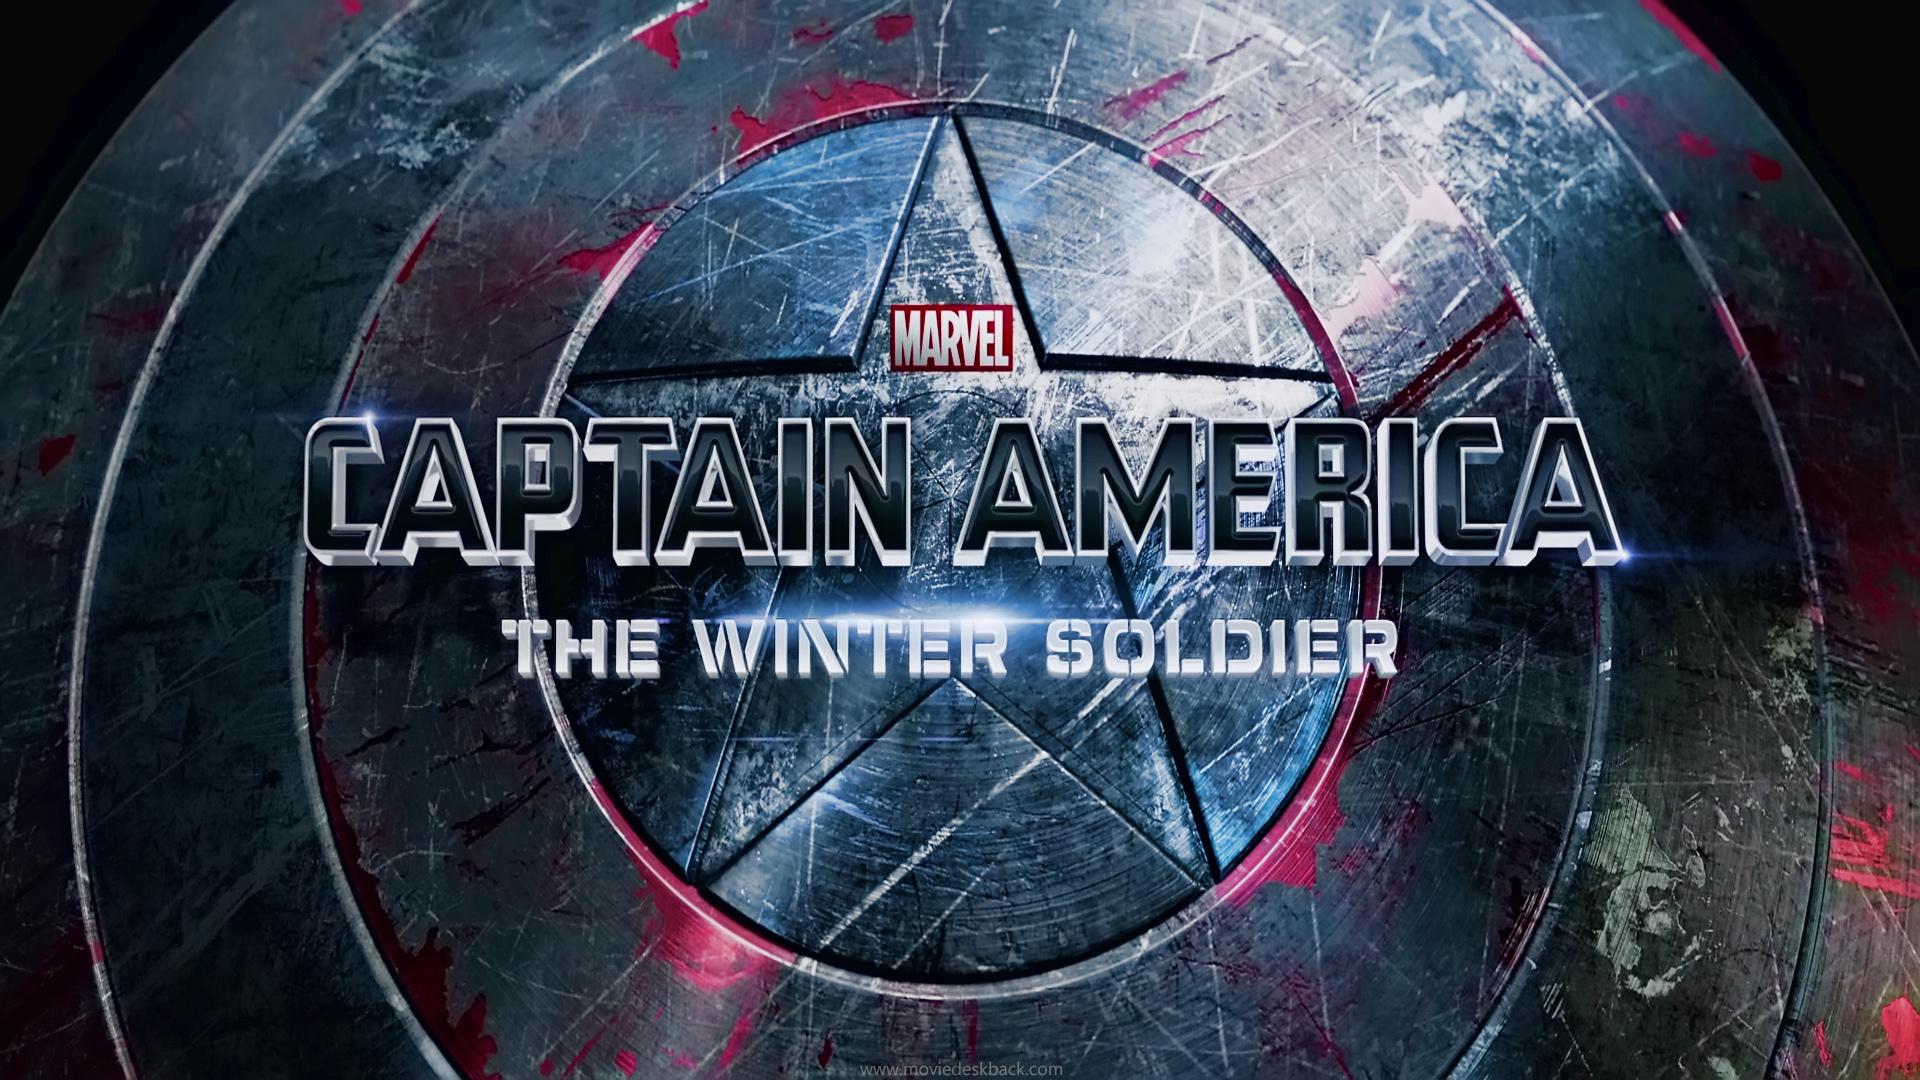 Captain America The Winter Soldier Wallpaper: Captain America: The Winter Soldier; Altruism Vs